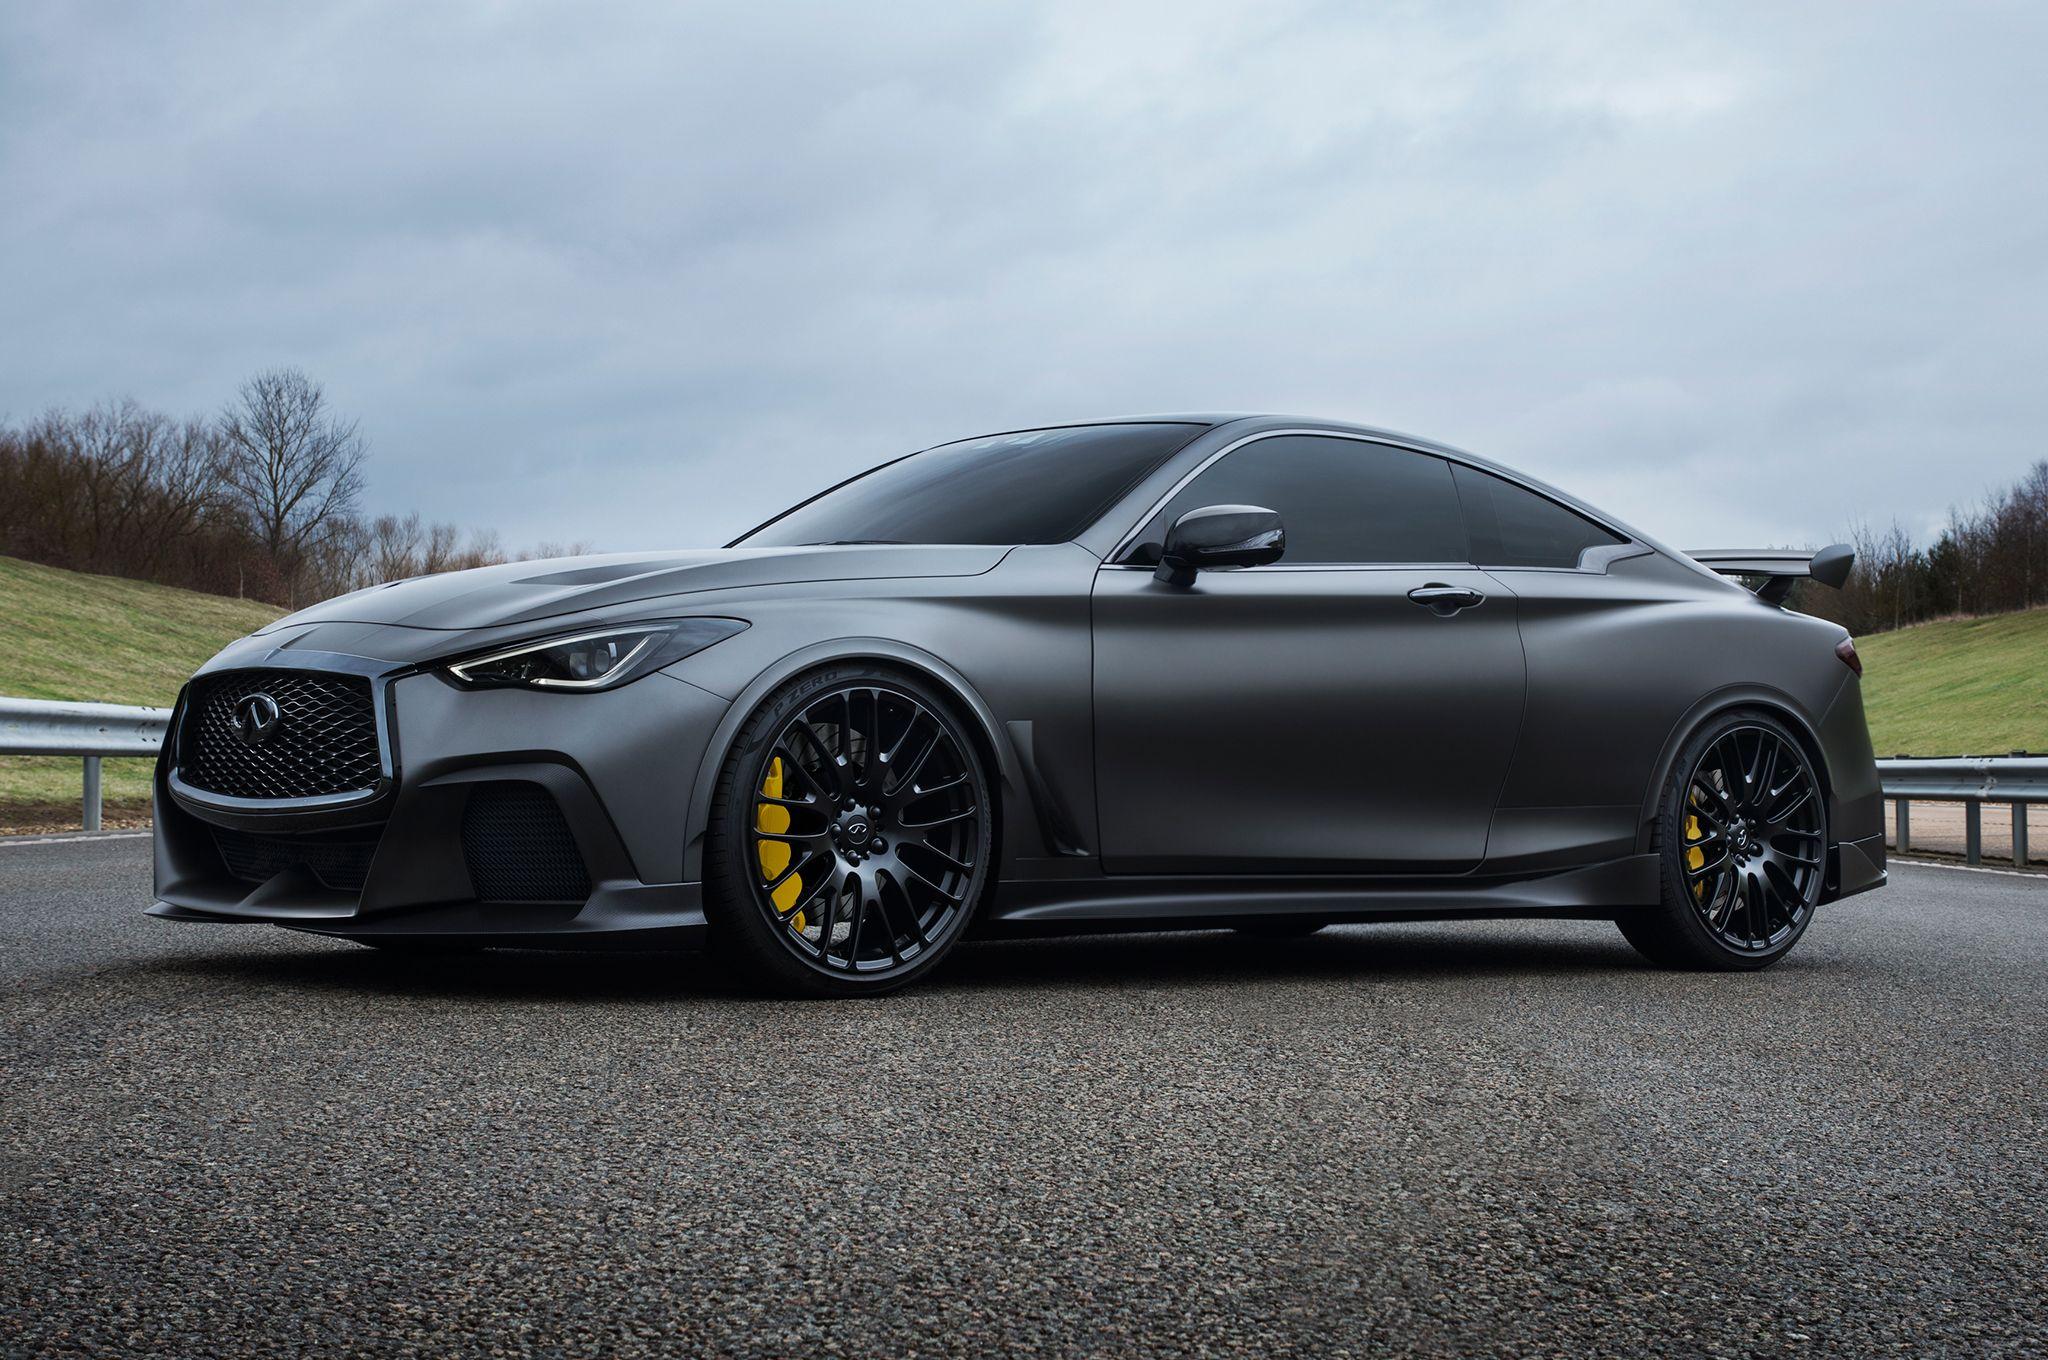 Infiniti Could Be Building 500 Hp Bmw M4 Fighter Slammed Cars Infiniti Q50 Pirelli Tires